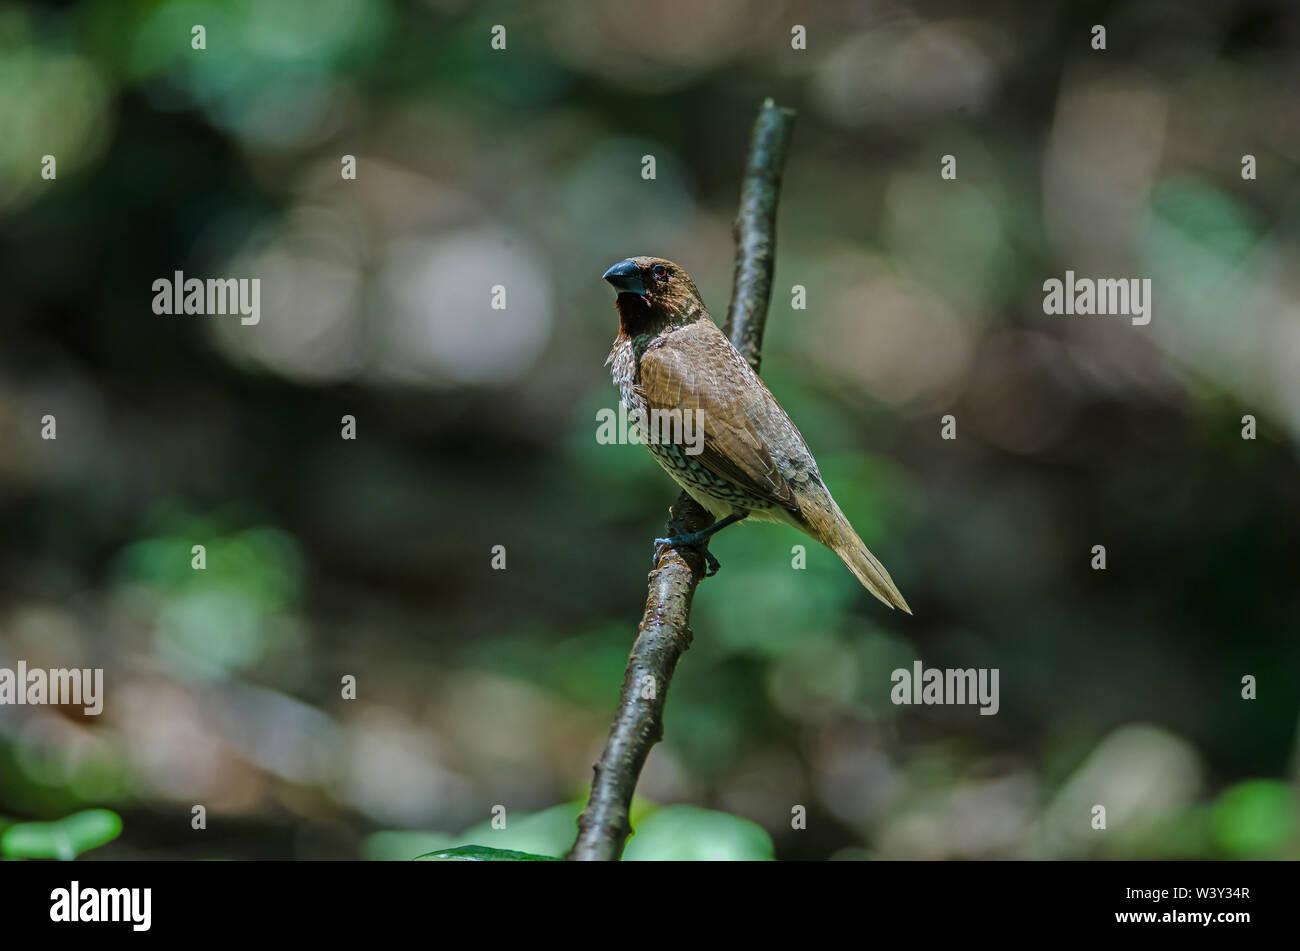 Scaly-breasted Munia (Lonchura punctulata) in nature, Thailand - Stock Image